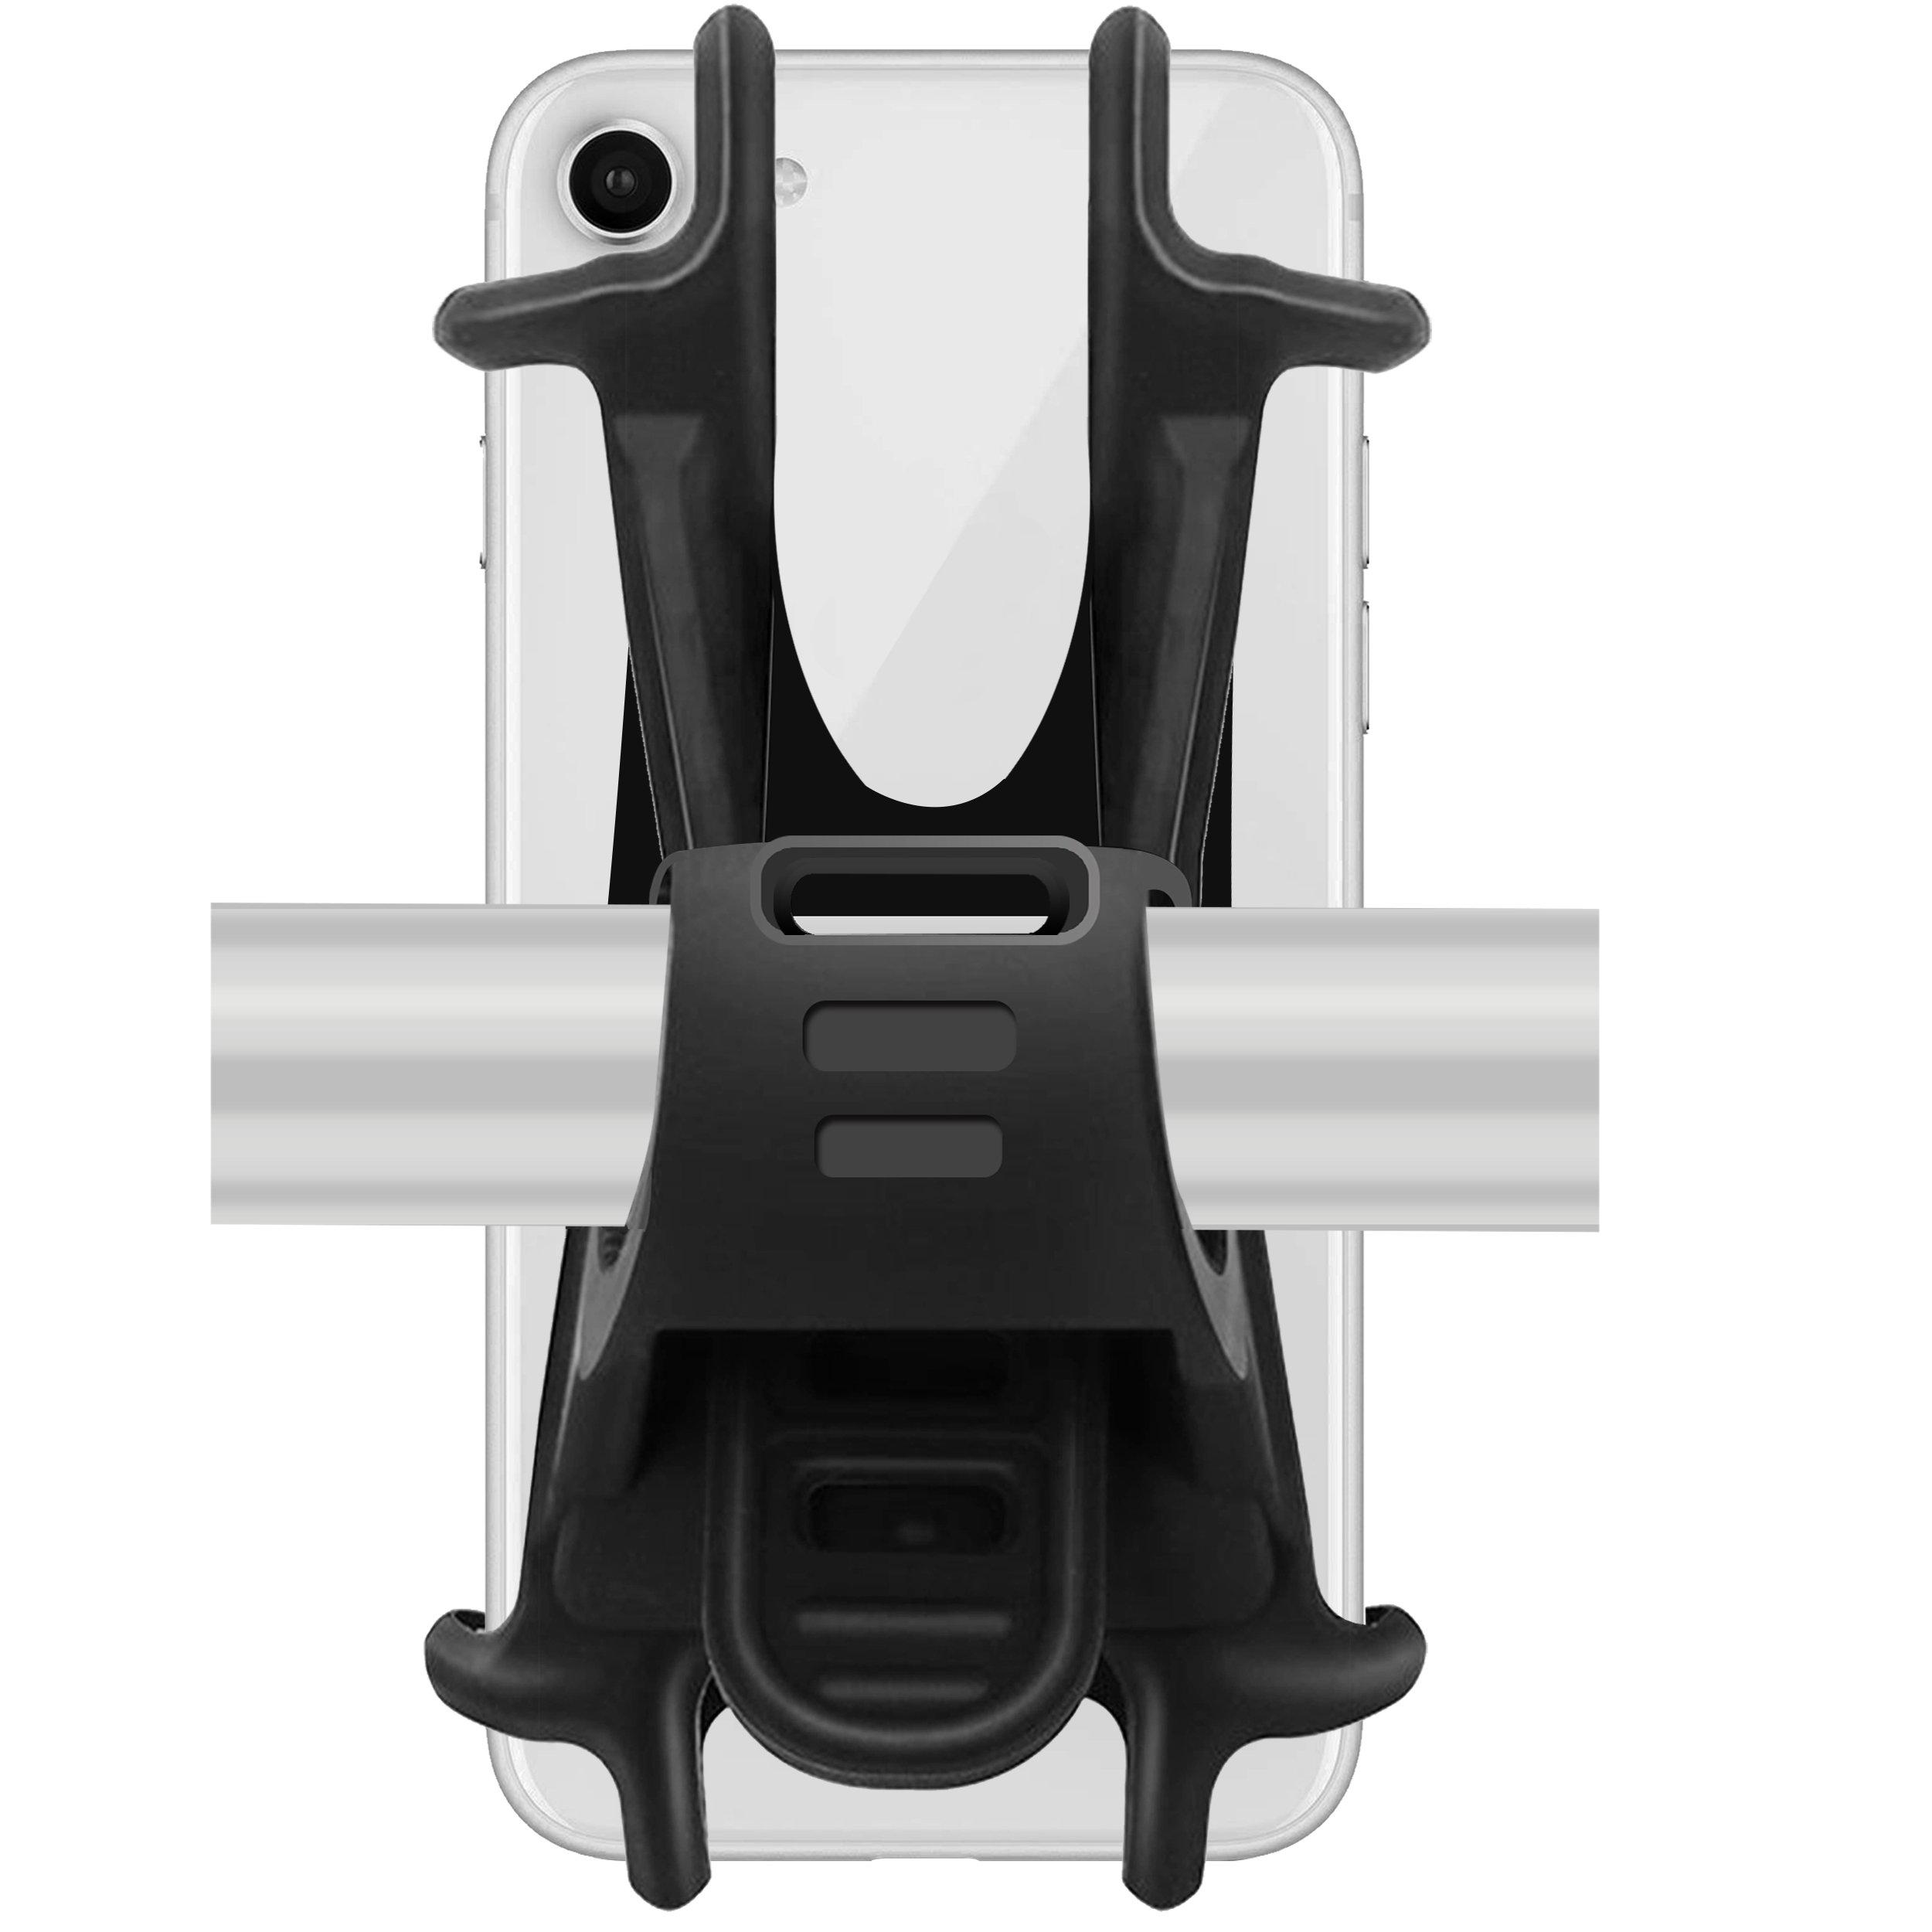 Ailun Motorcycle Accessories Adjustable Compatible